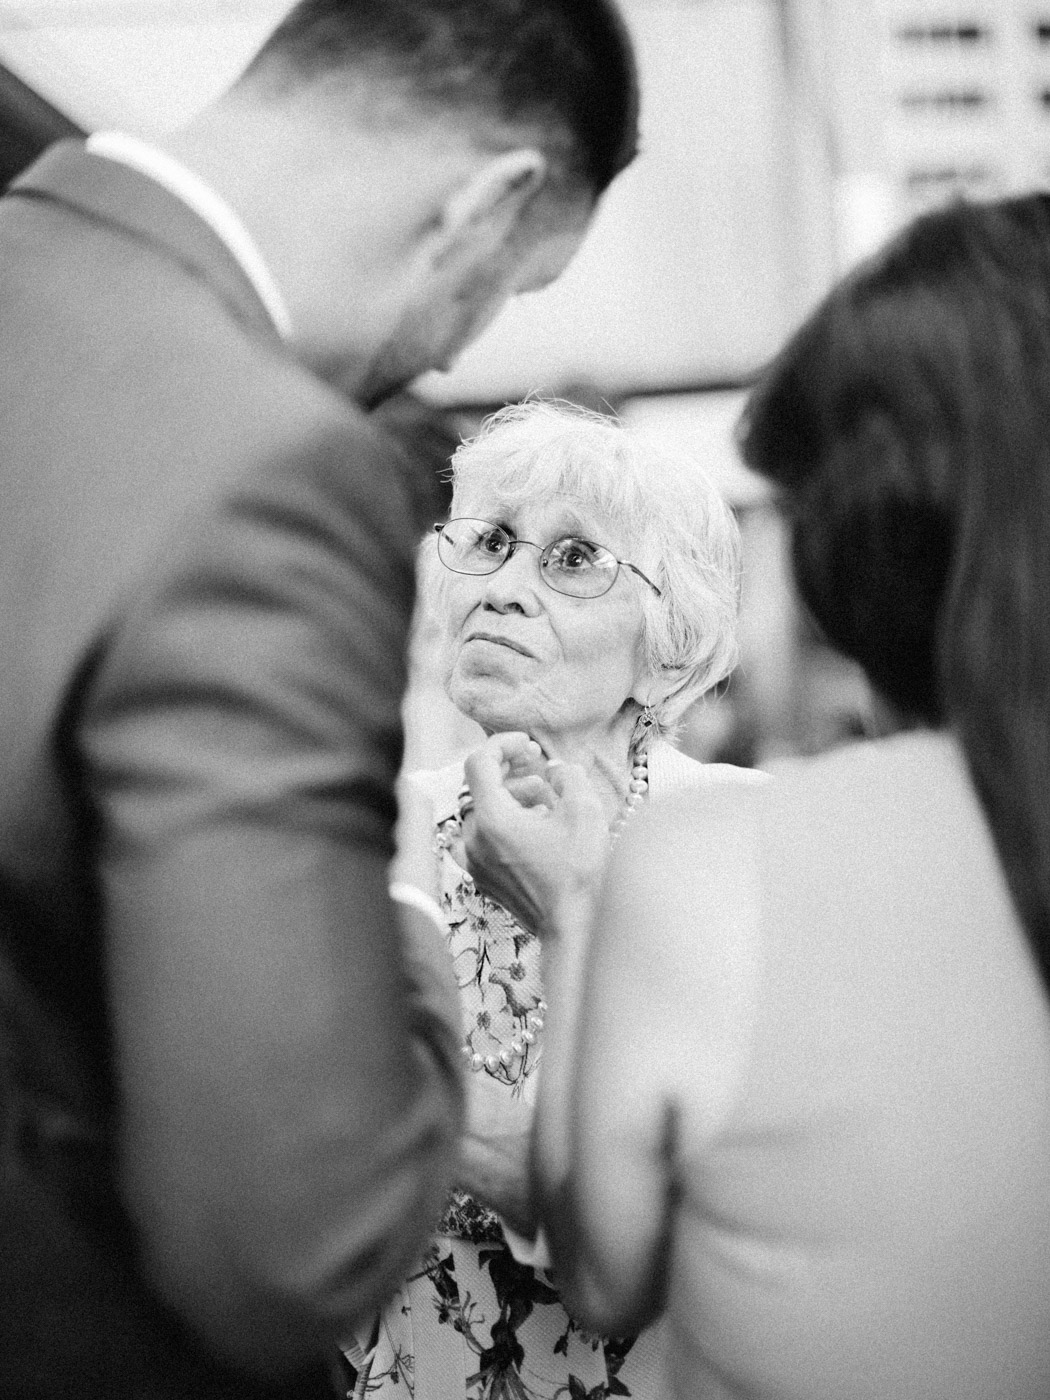 toronto_wedding_photographer_fine_art_documentary-372.jpg